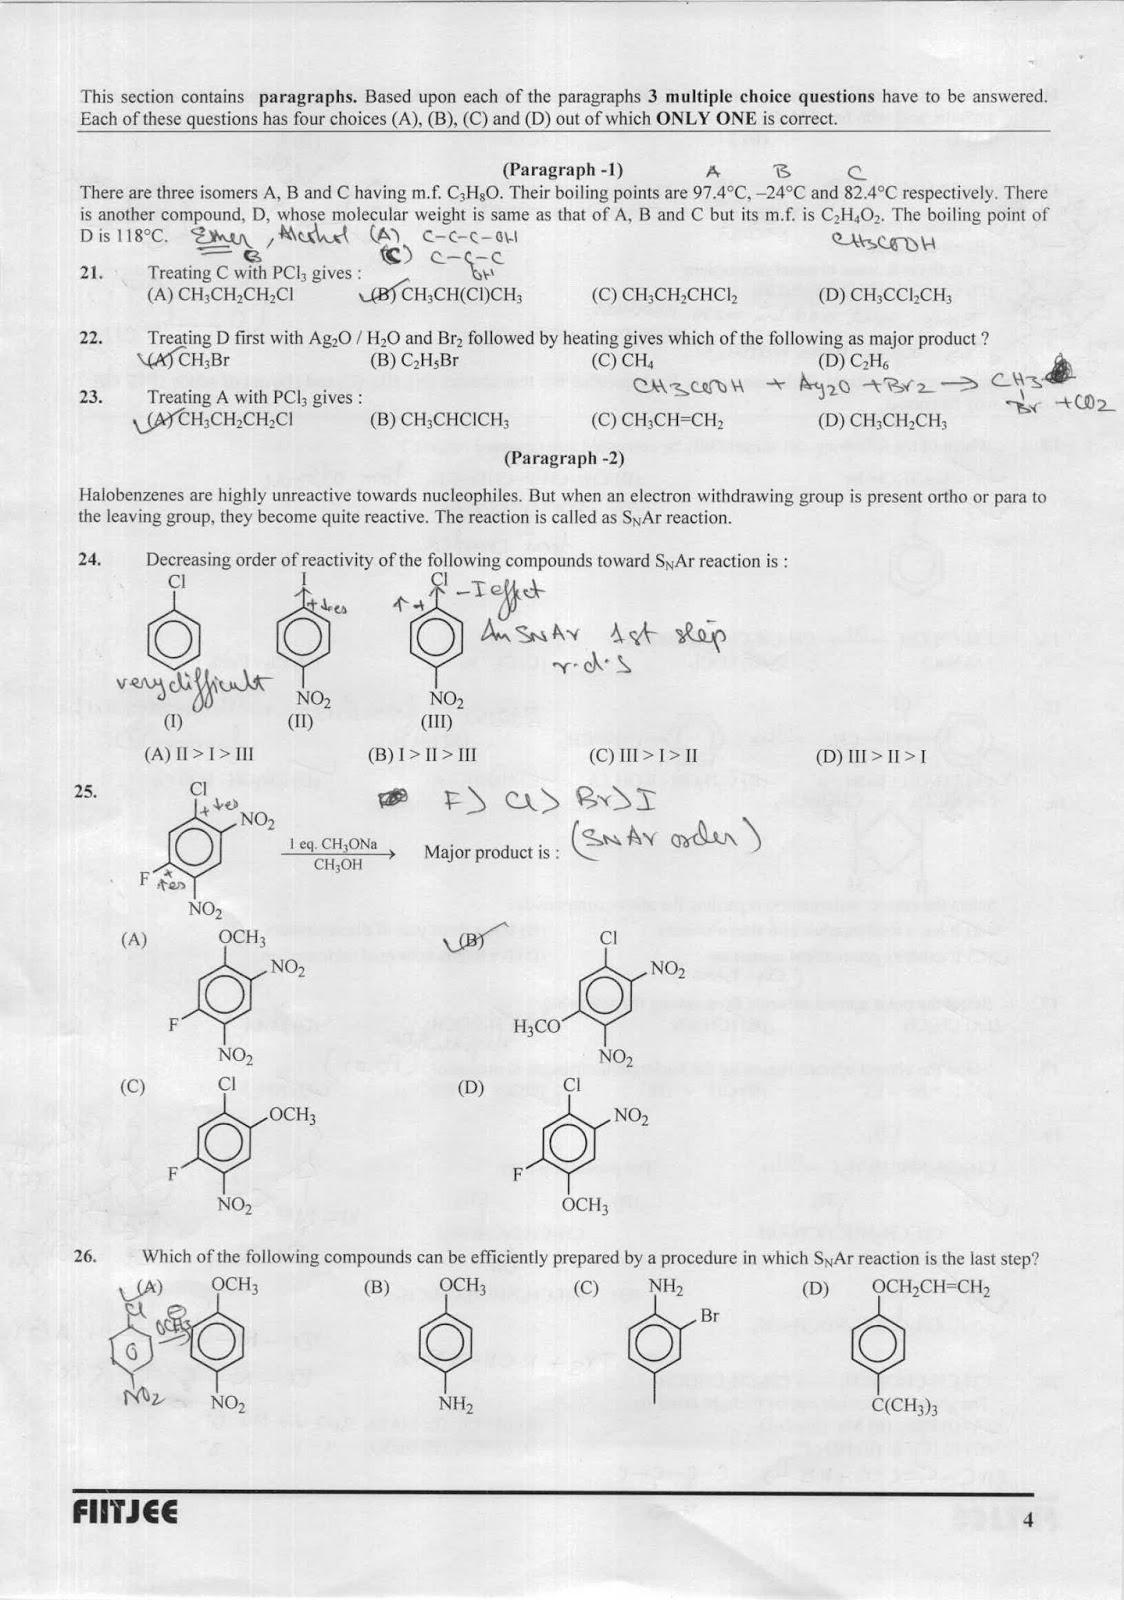 IITJEE Chemistry by Dhruv kumar Banerjee: KVPY ORGANIC